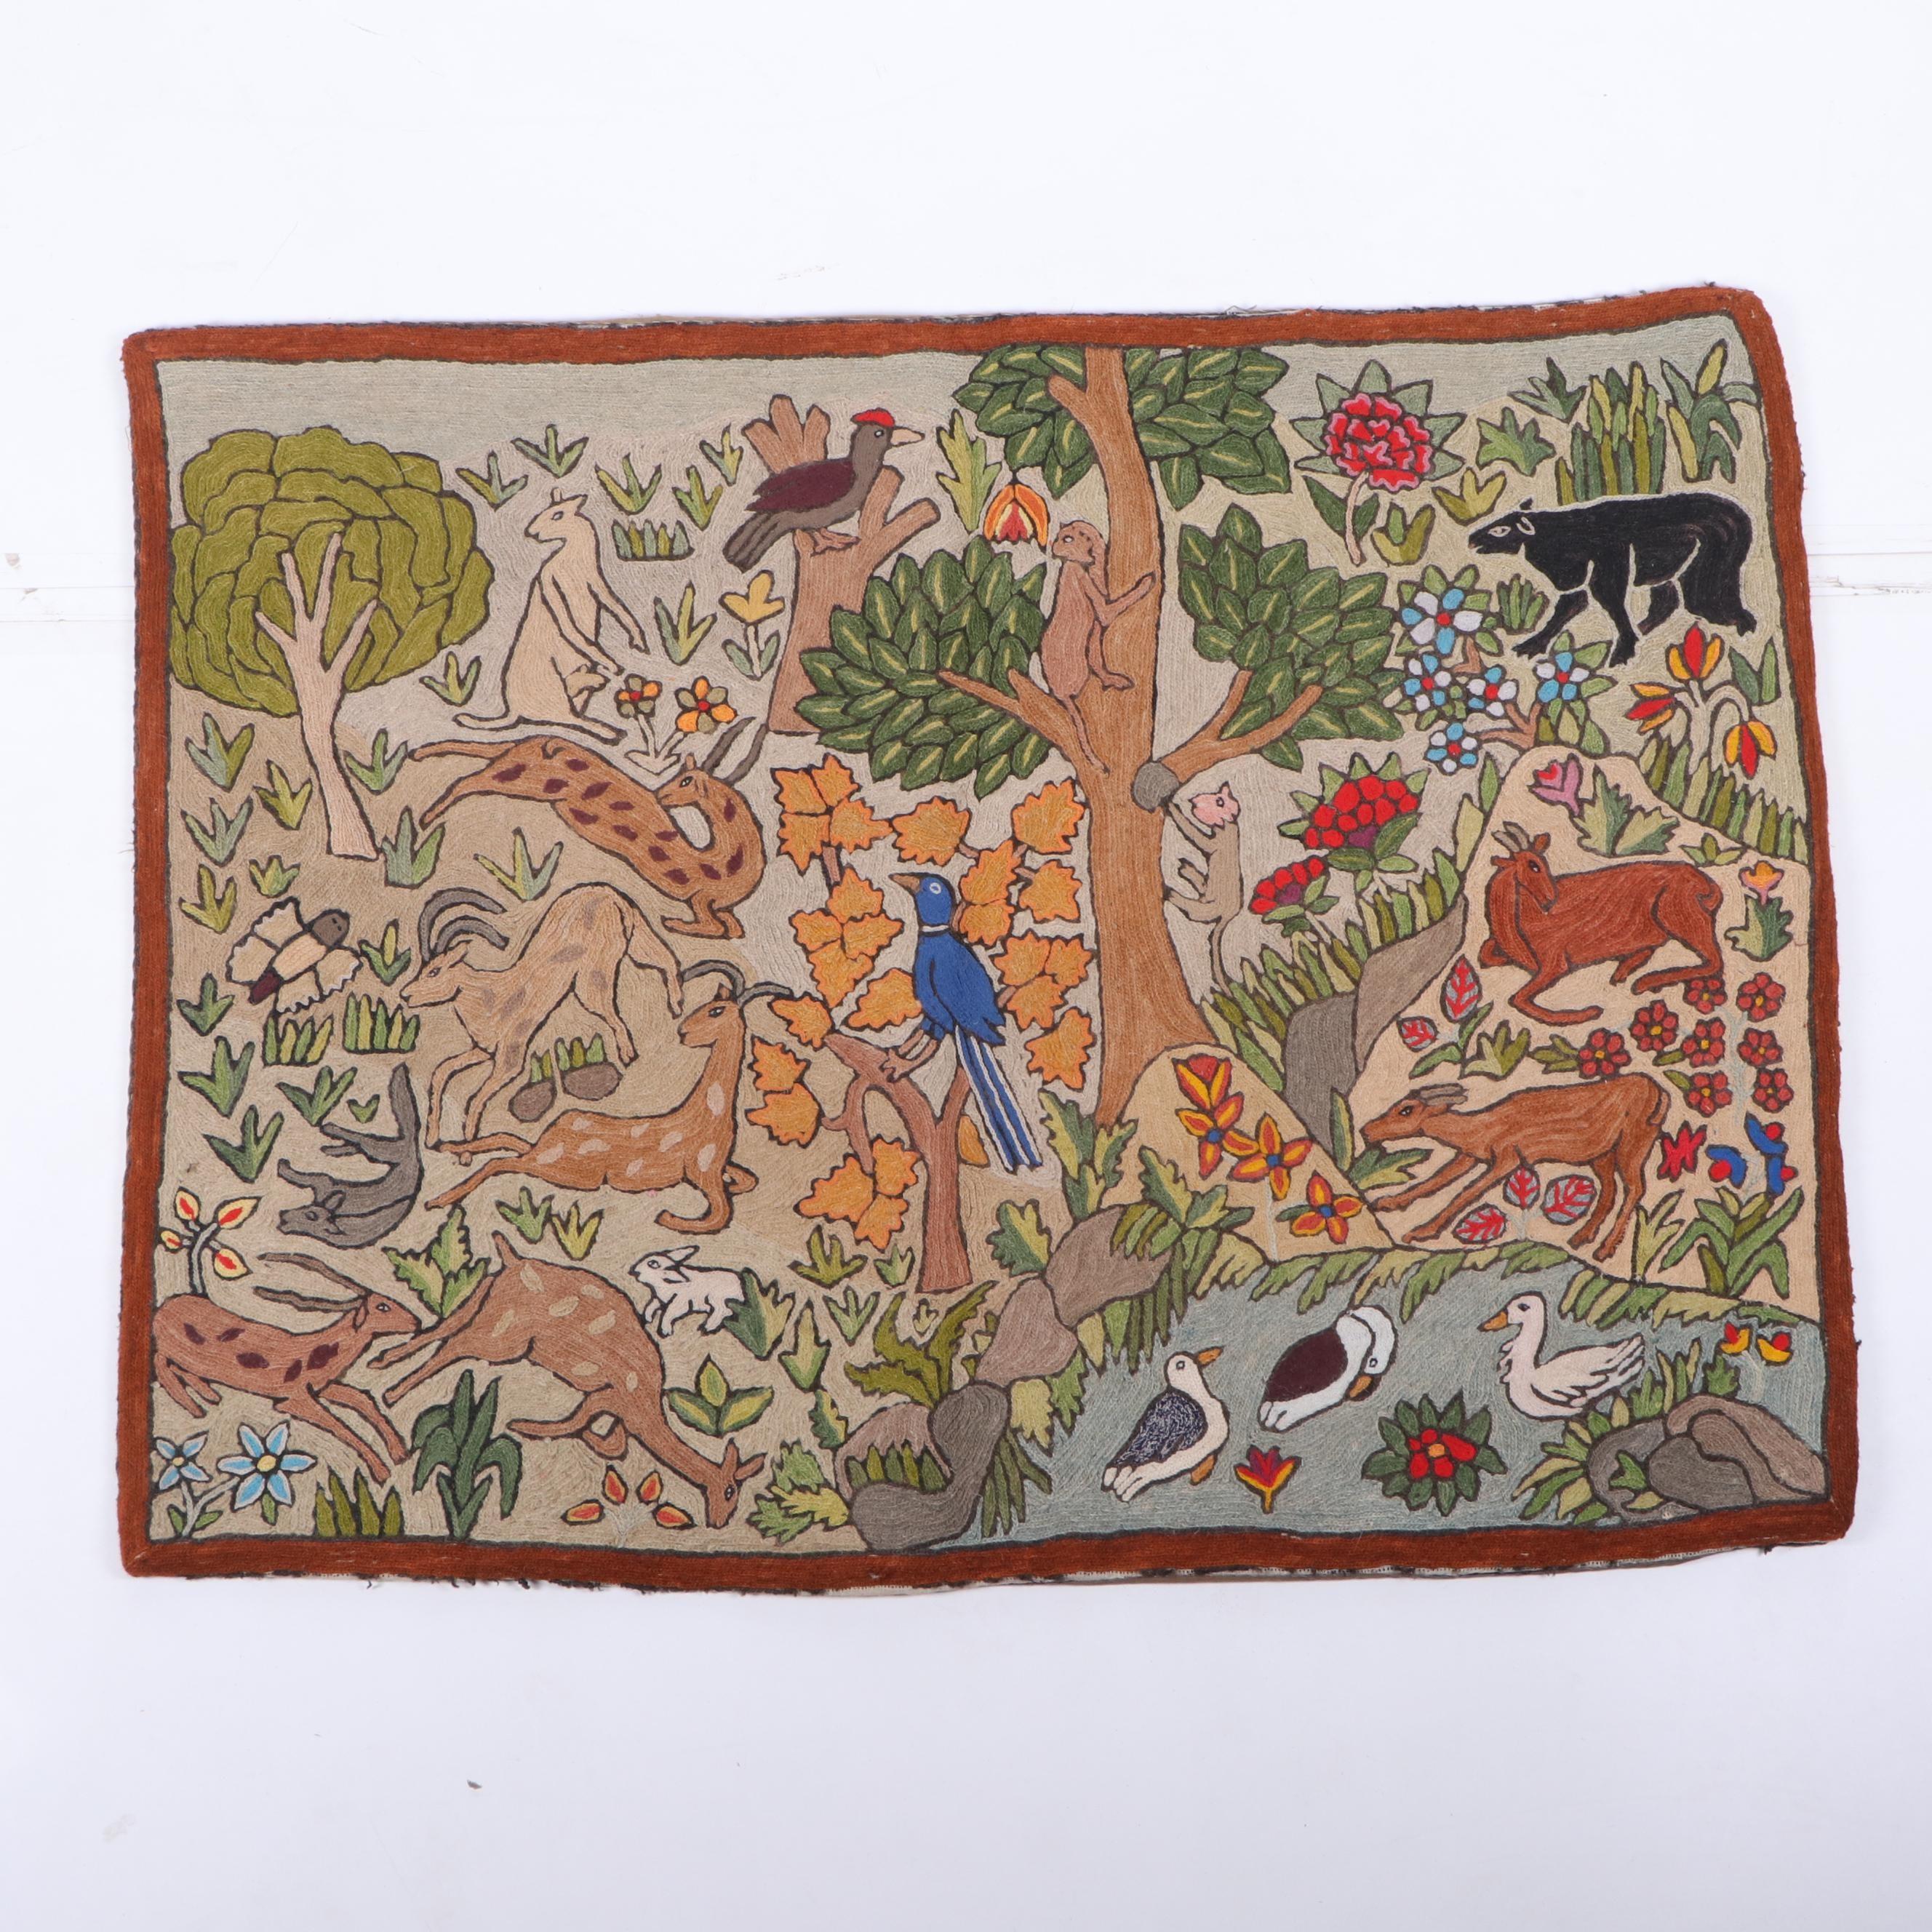 Handmade Latin American Crewel Embroidery Animal Themed Wall Hanging